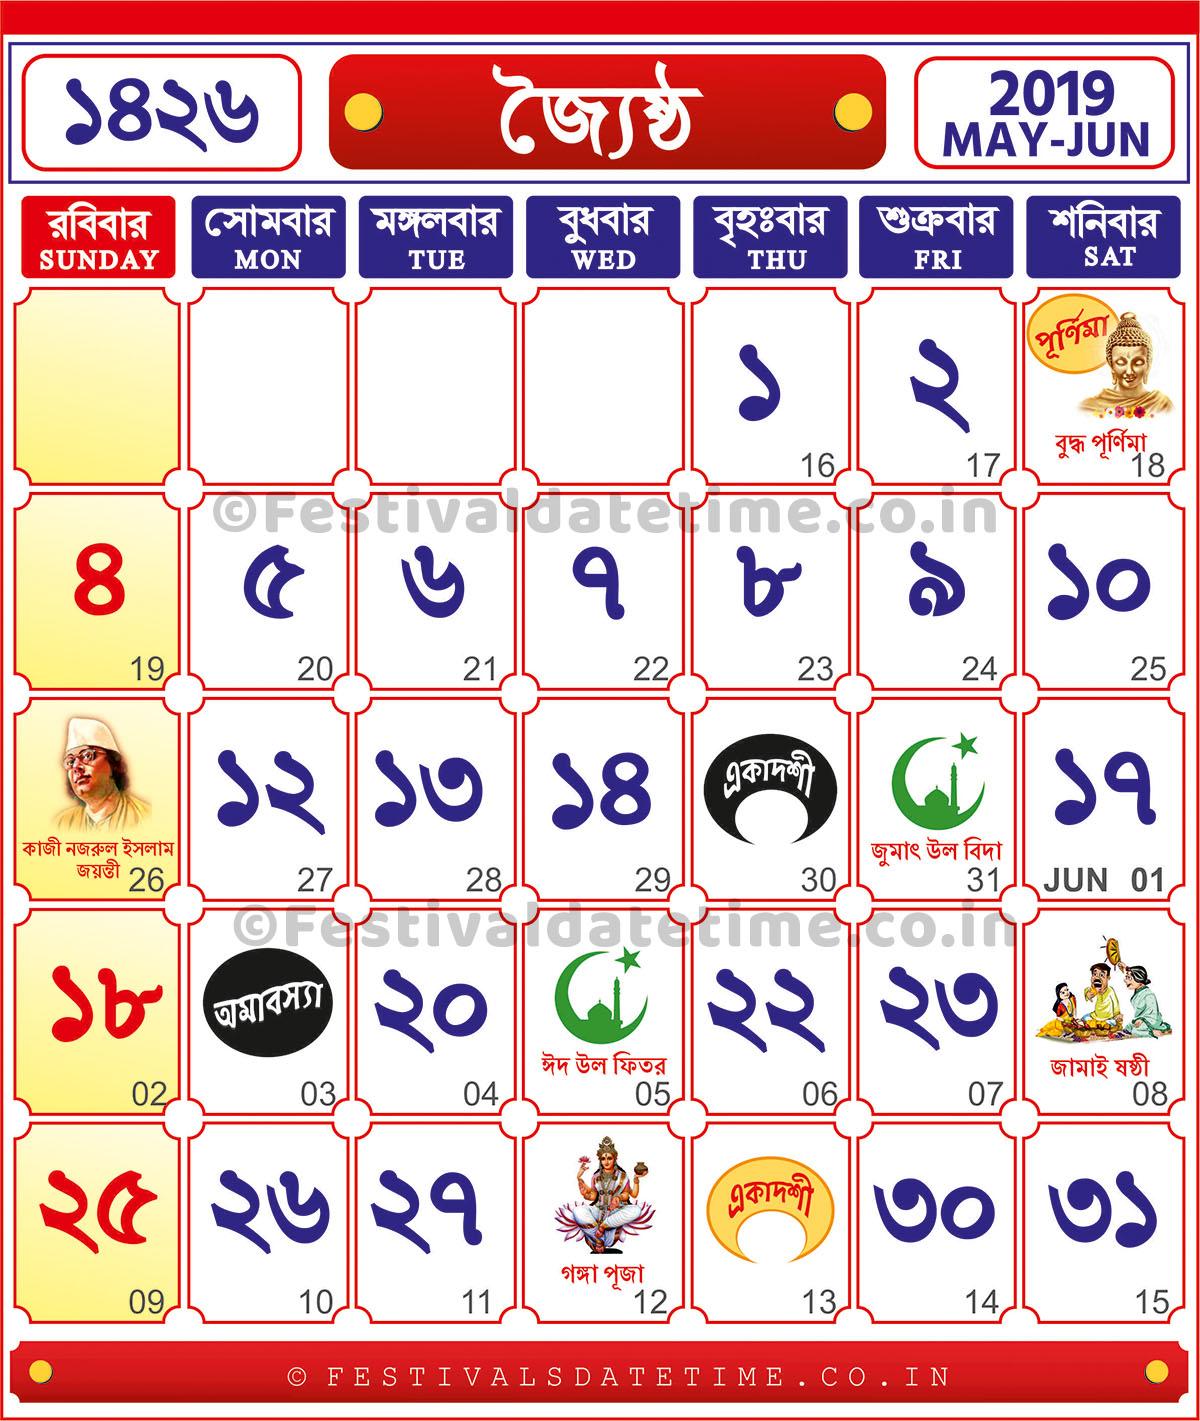 1426 Jaistho : 1426 Bengali Calendar, Bengali Calendar 2019-2020 & 2021